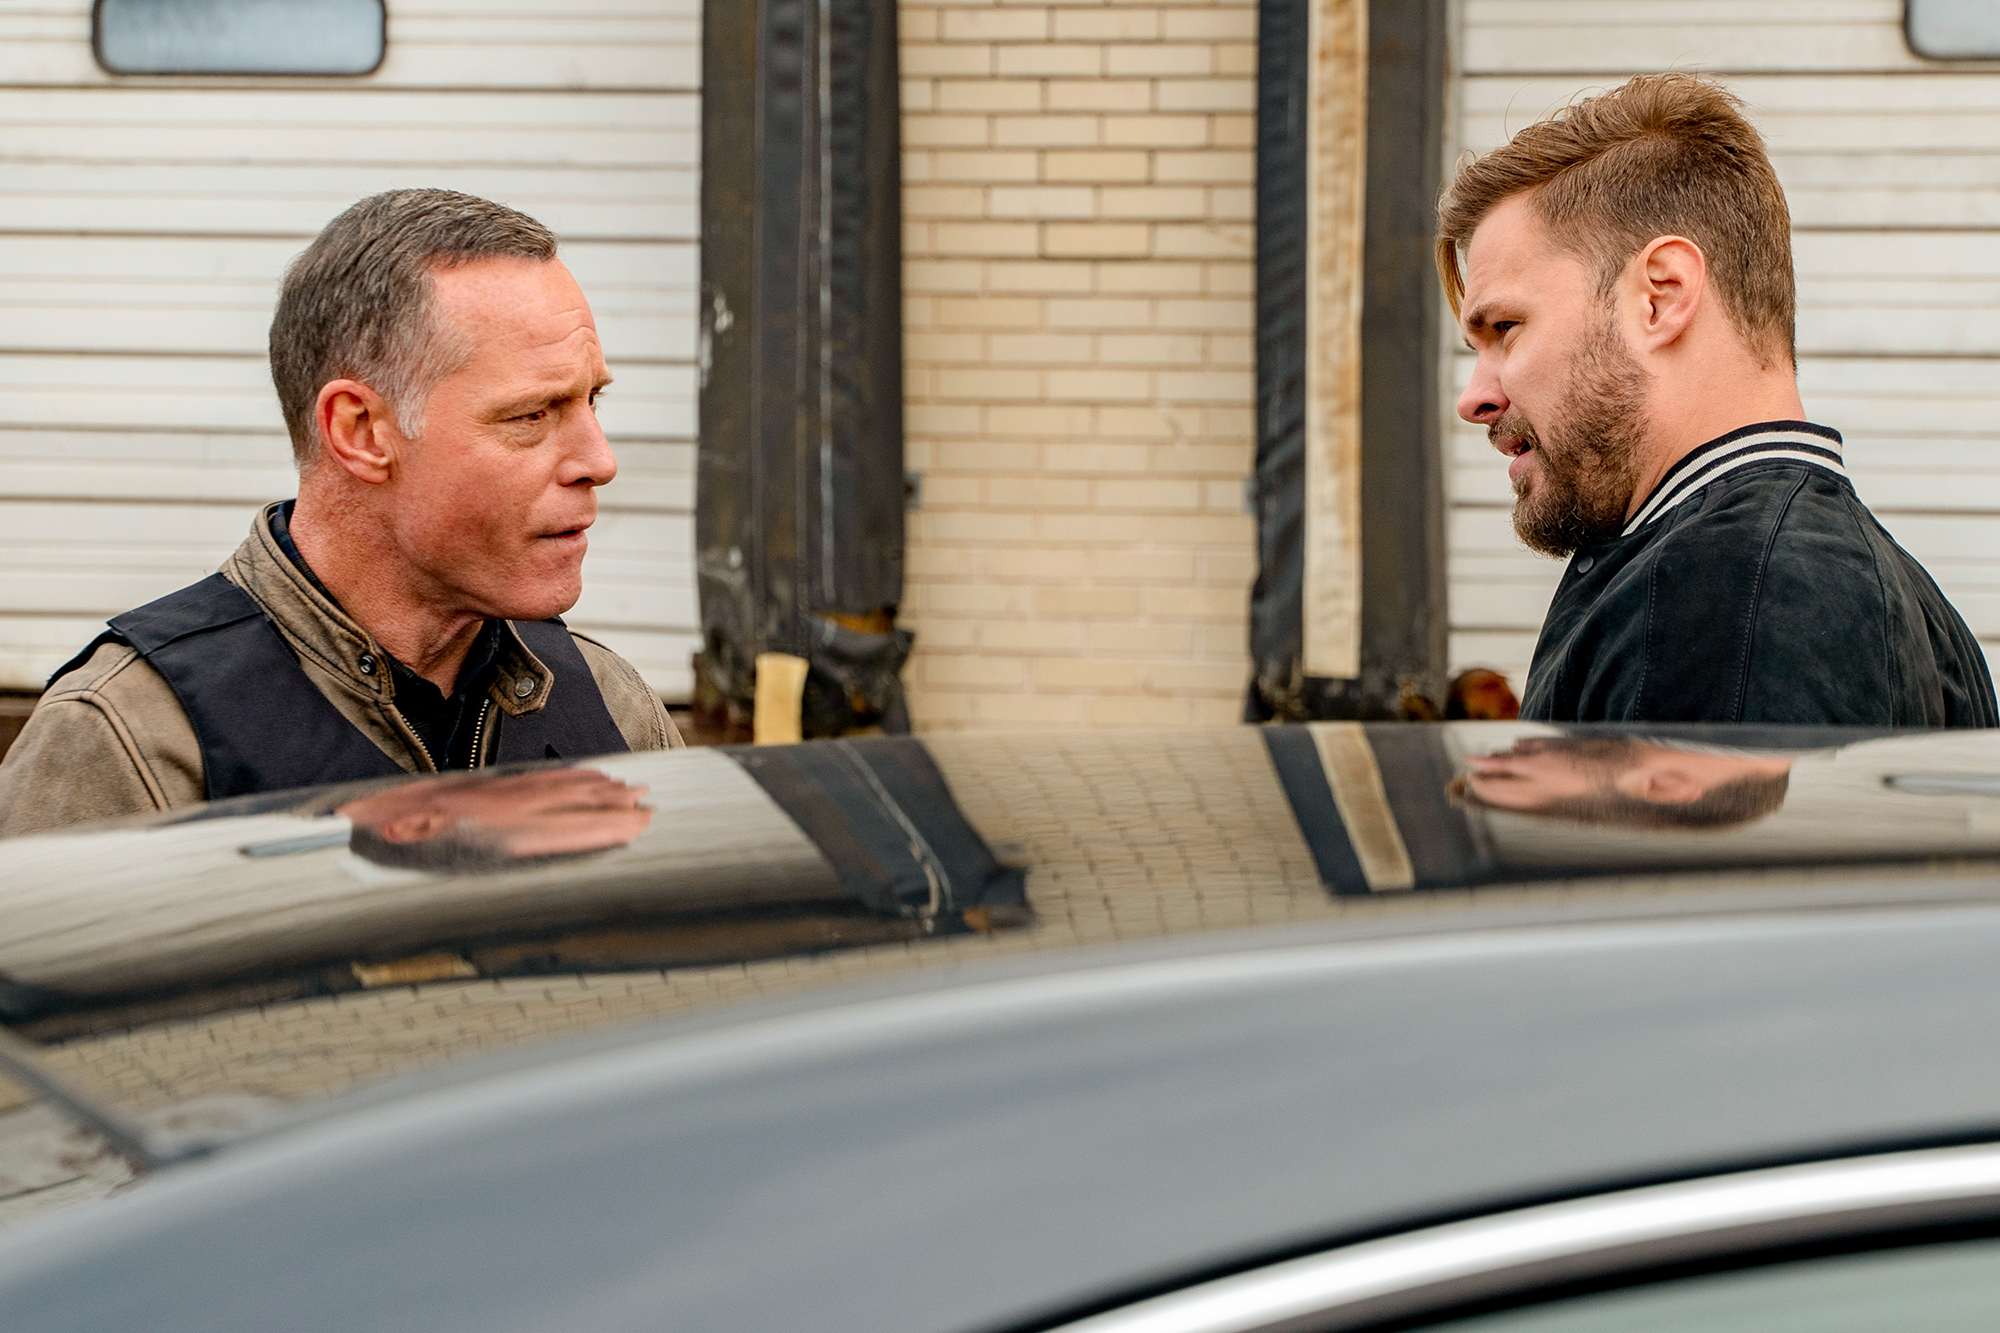 Patrick Flueger Teases Ruzek Consequences Halstead and Upton Bond - Jason Beghe and Patrick John Flueger on Chicago P.D.